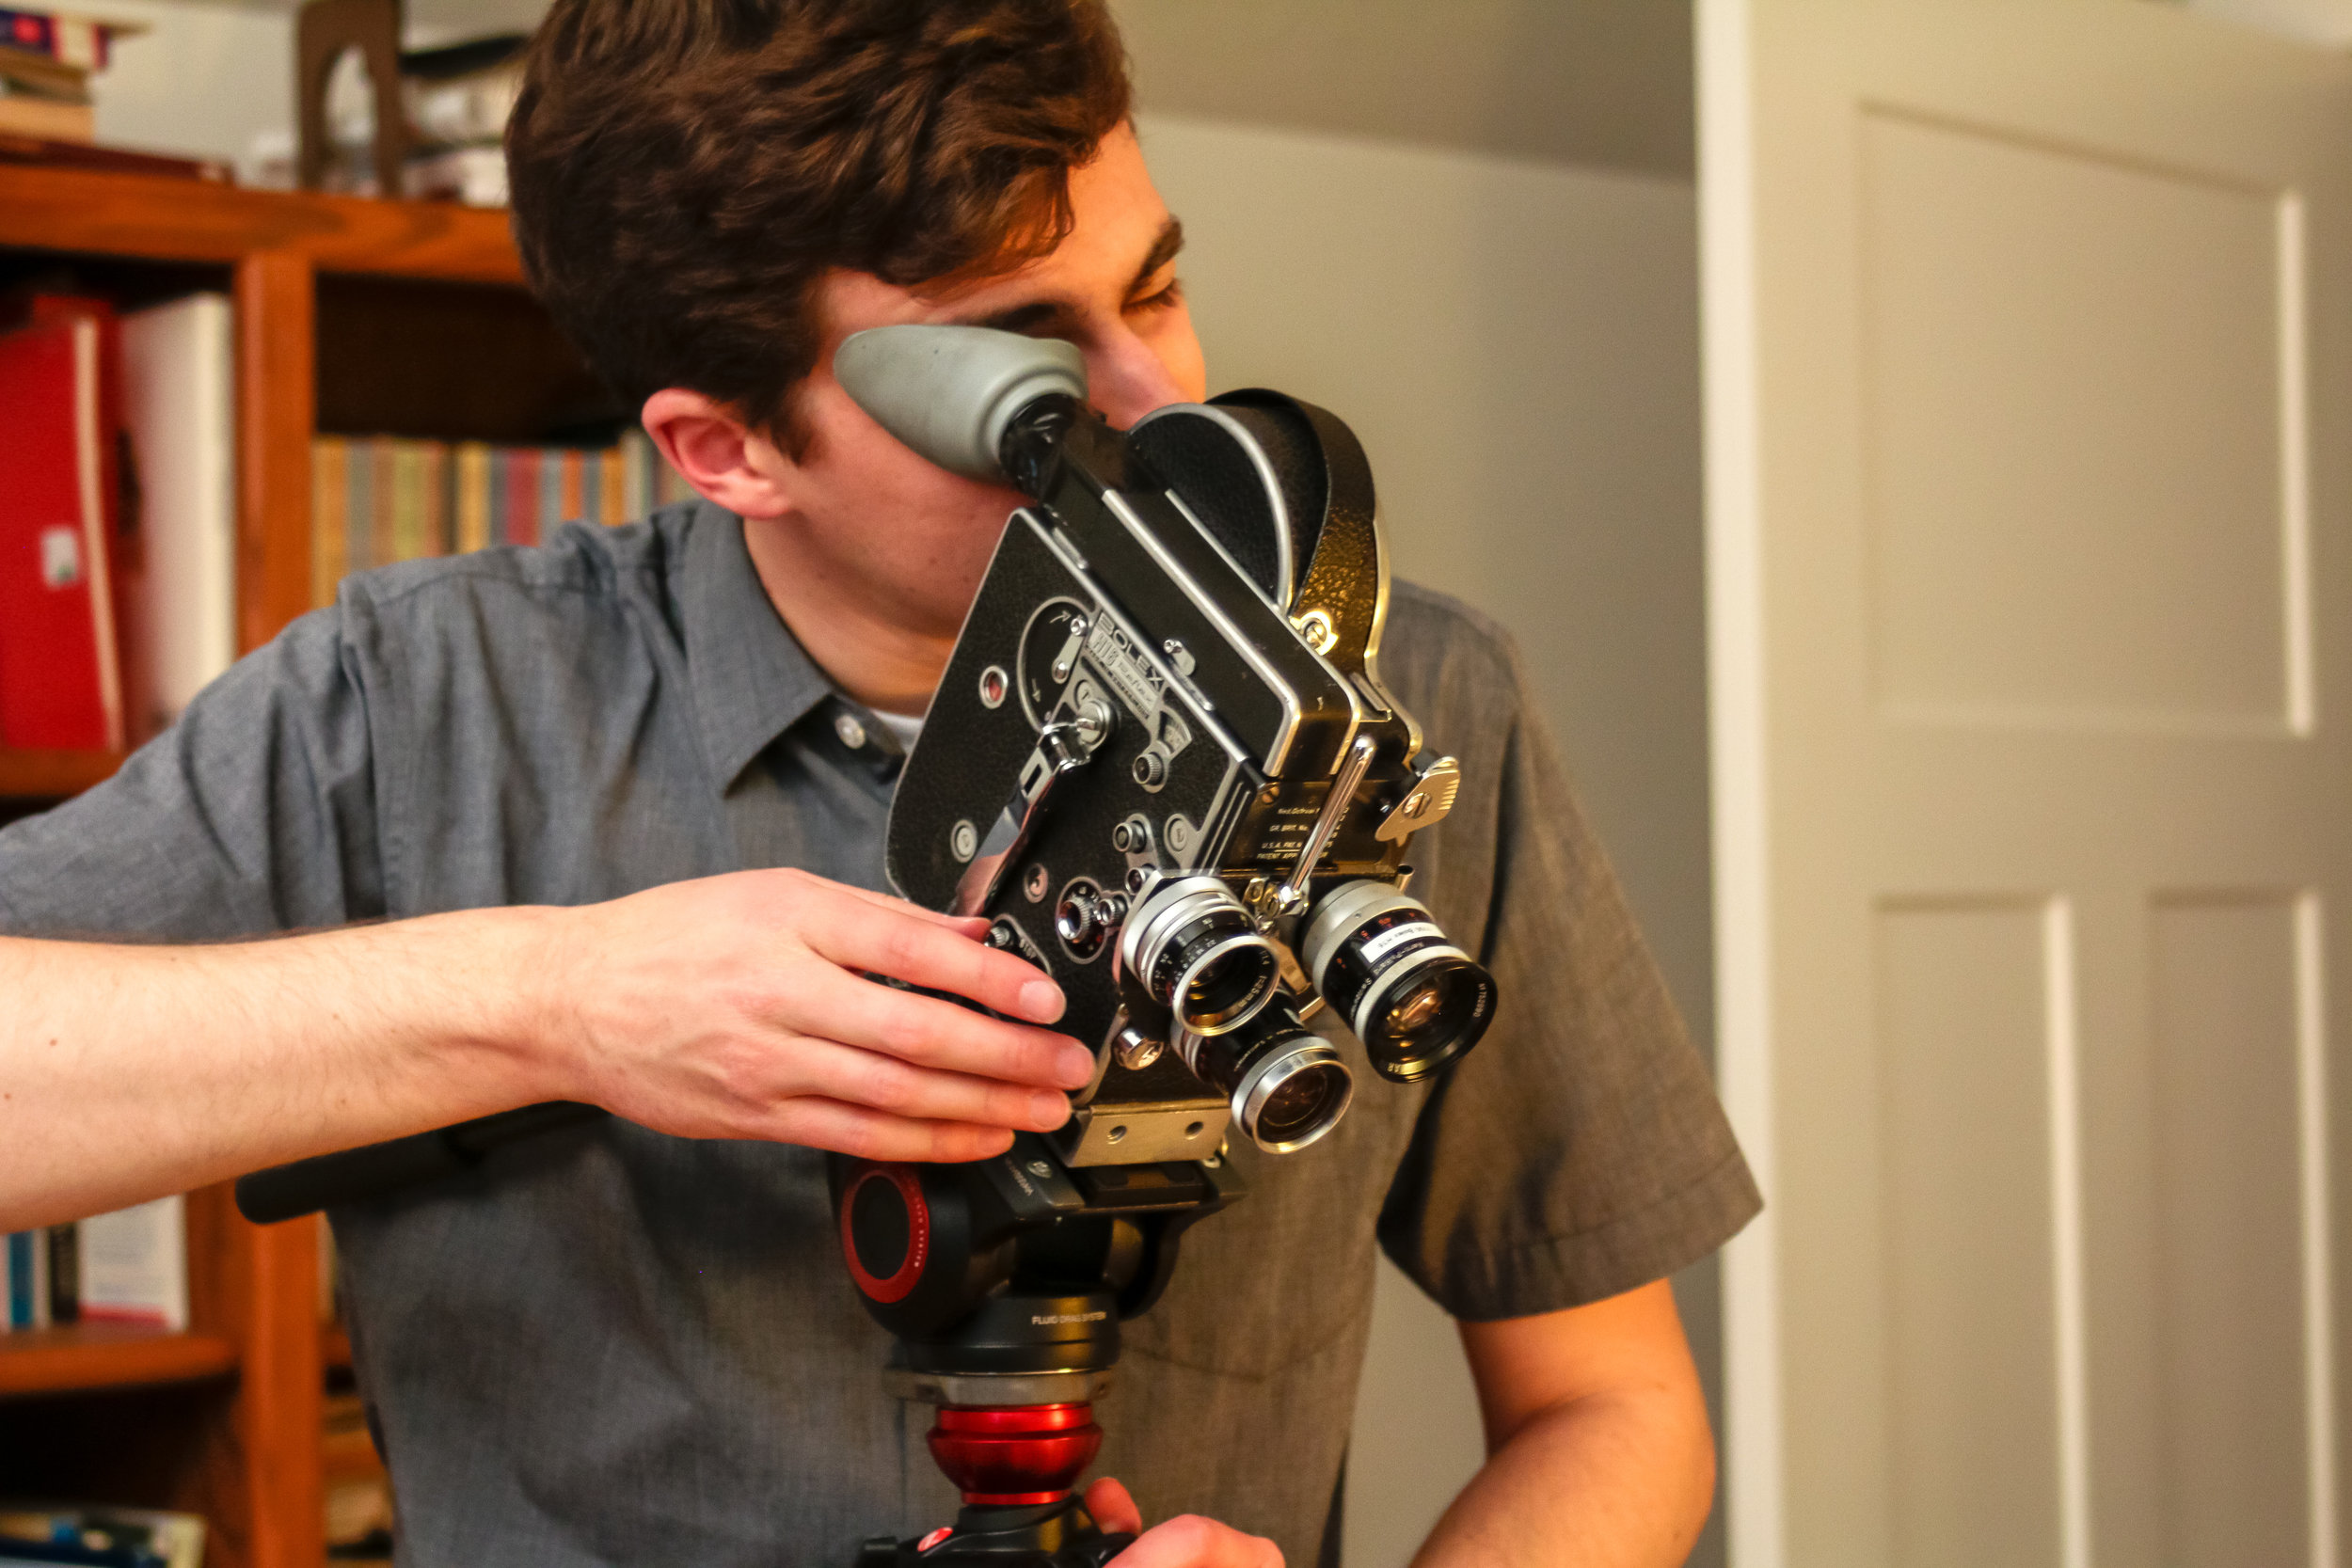 peter-c-davidson-camera.jpg